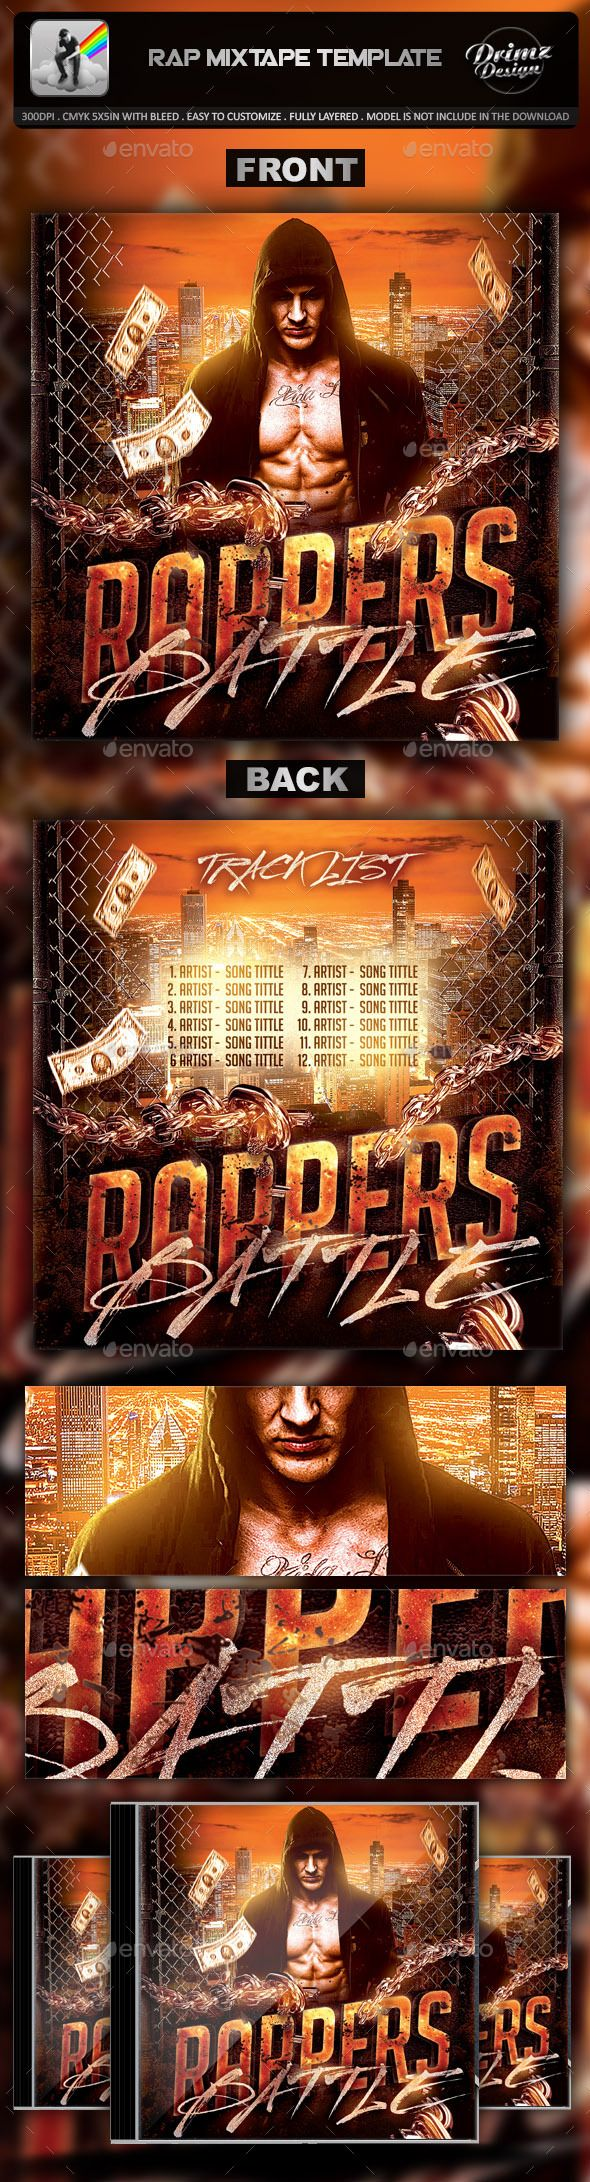 Rap Mixtape Template — Photoshop PSD #sweater #dvd • Available here → https://graphicriver.net/item/rap-mixtape-template/9401145?ref=pxcr